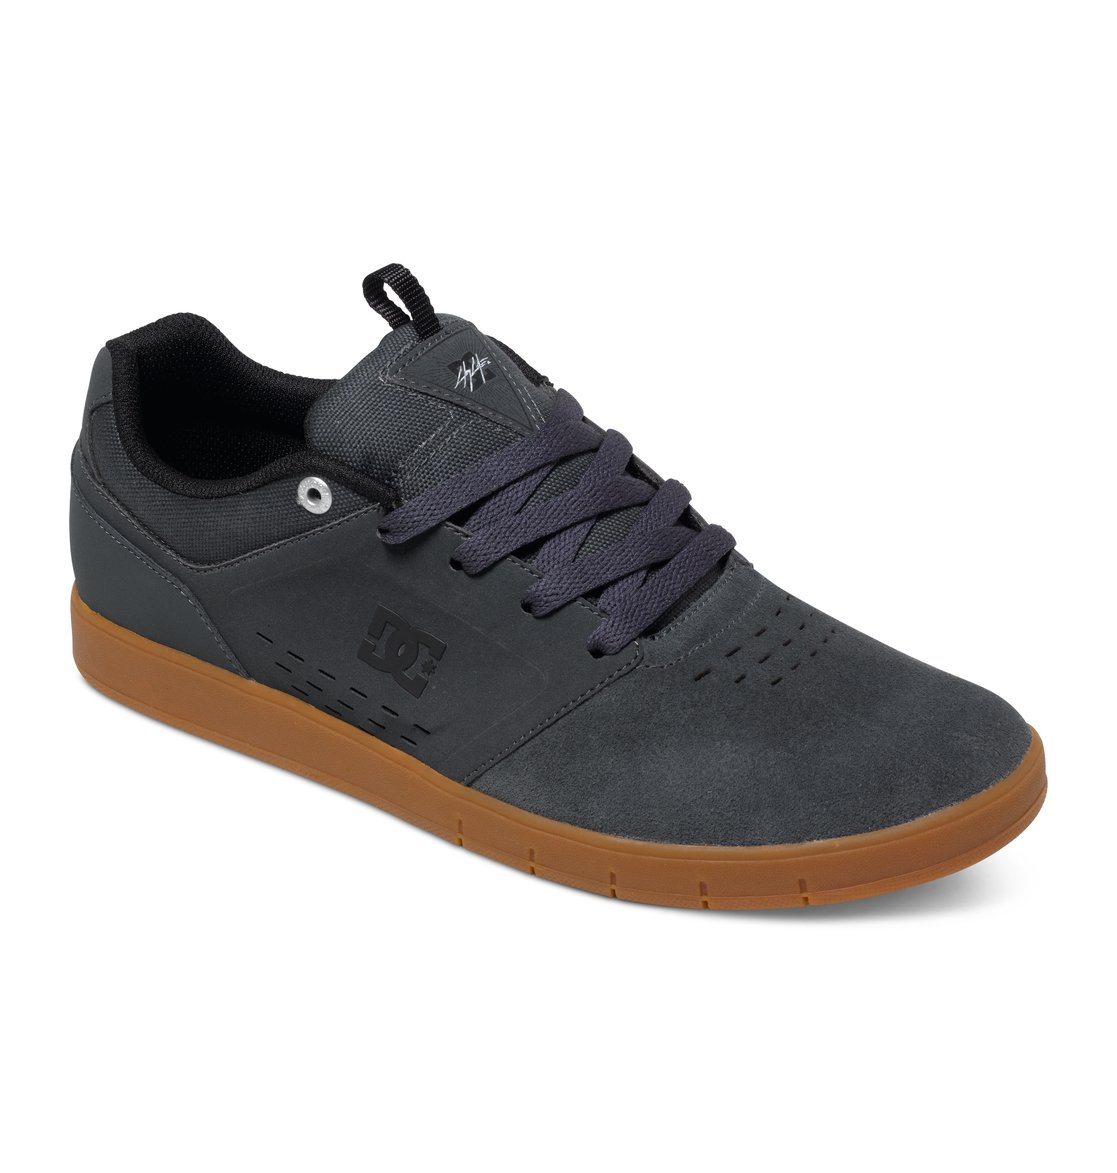 Shoes Männer Für Cole Signature Schuhe Adys100231Dc 0PZNwk8nOX